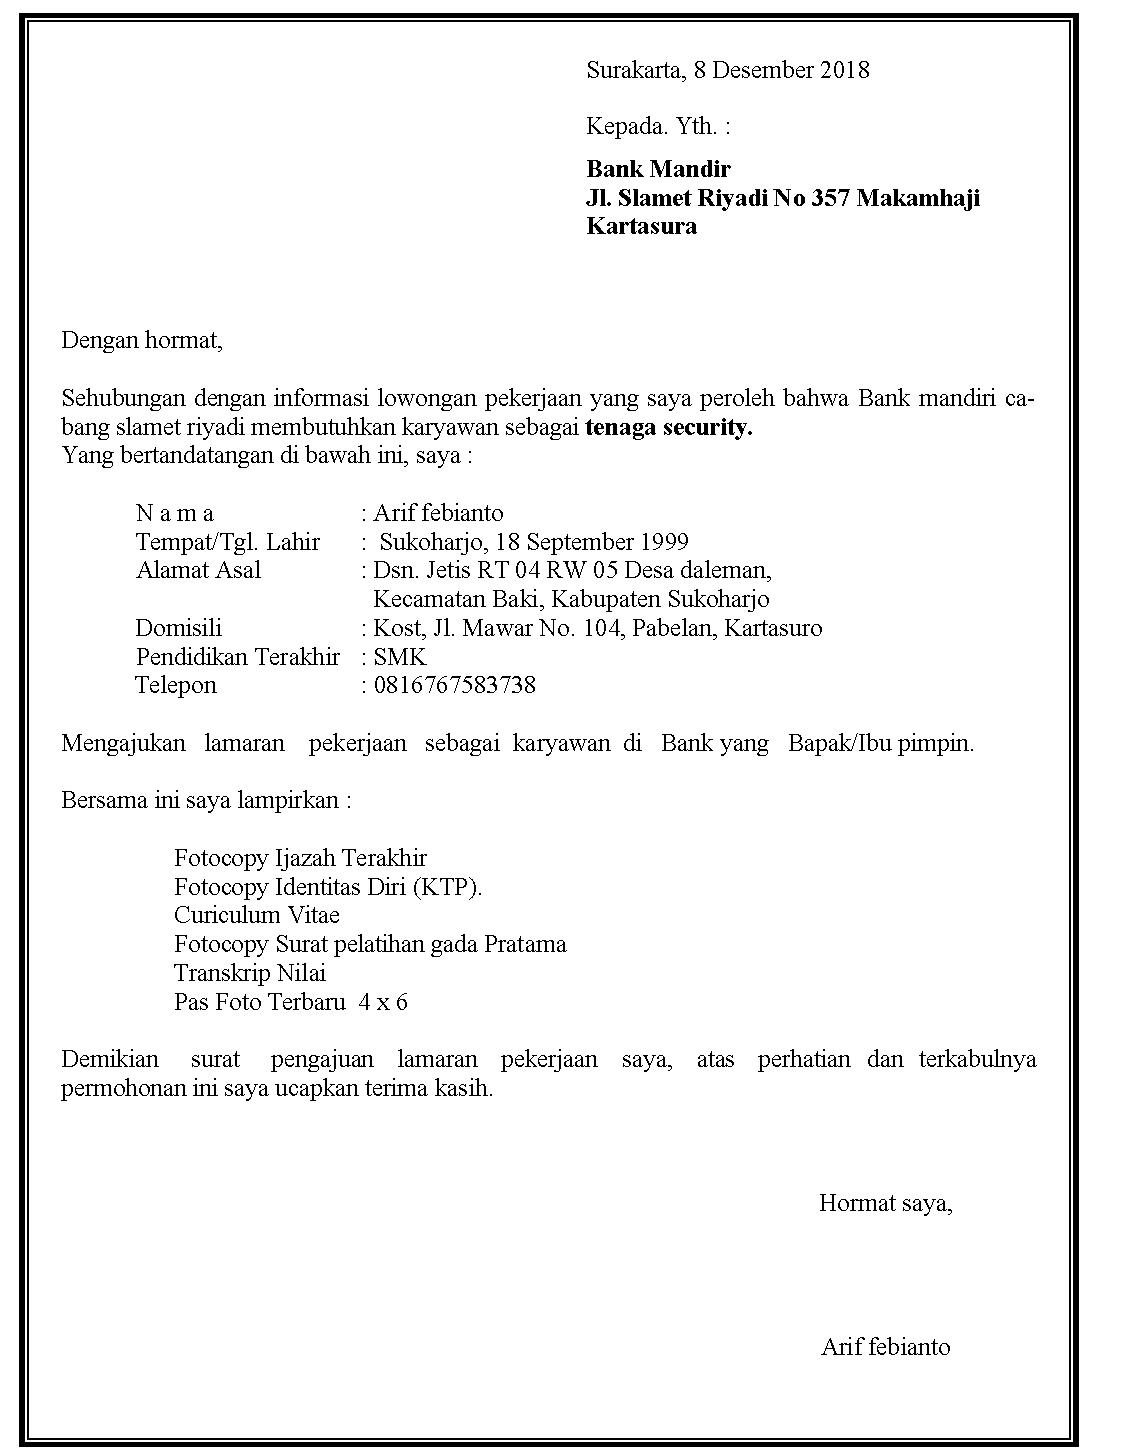 Contoh surat lamaran kerja security di Bank Mandiri